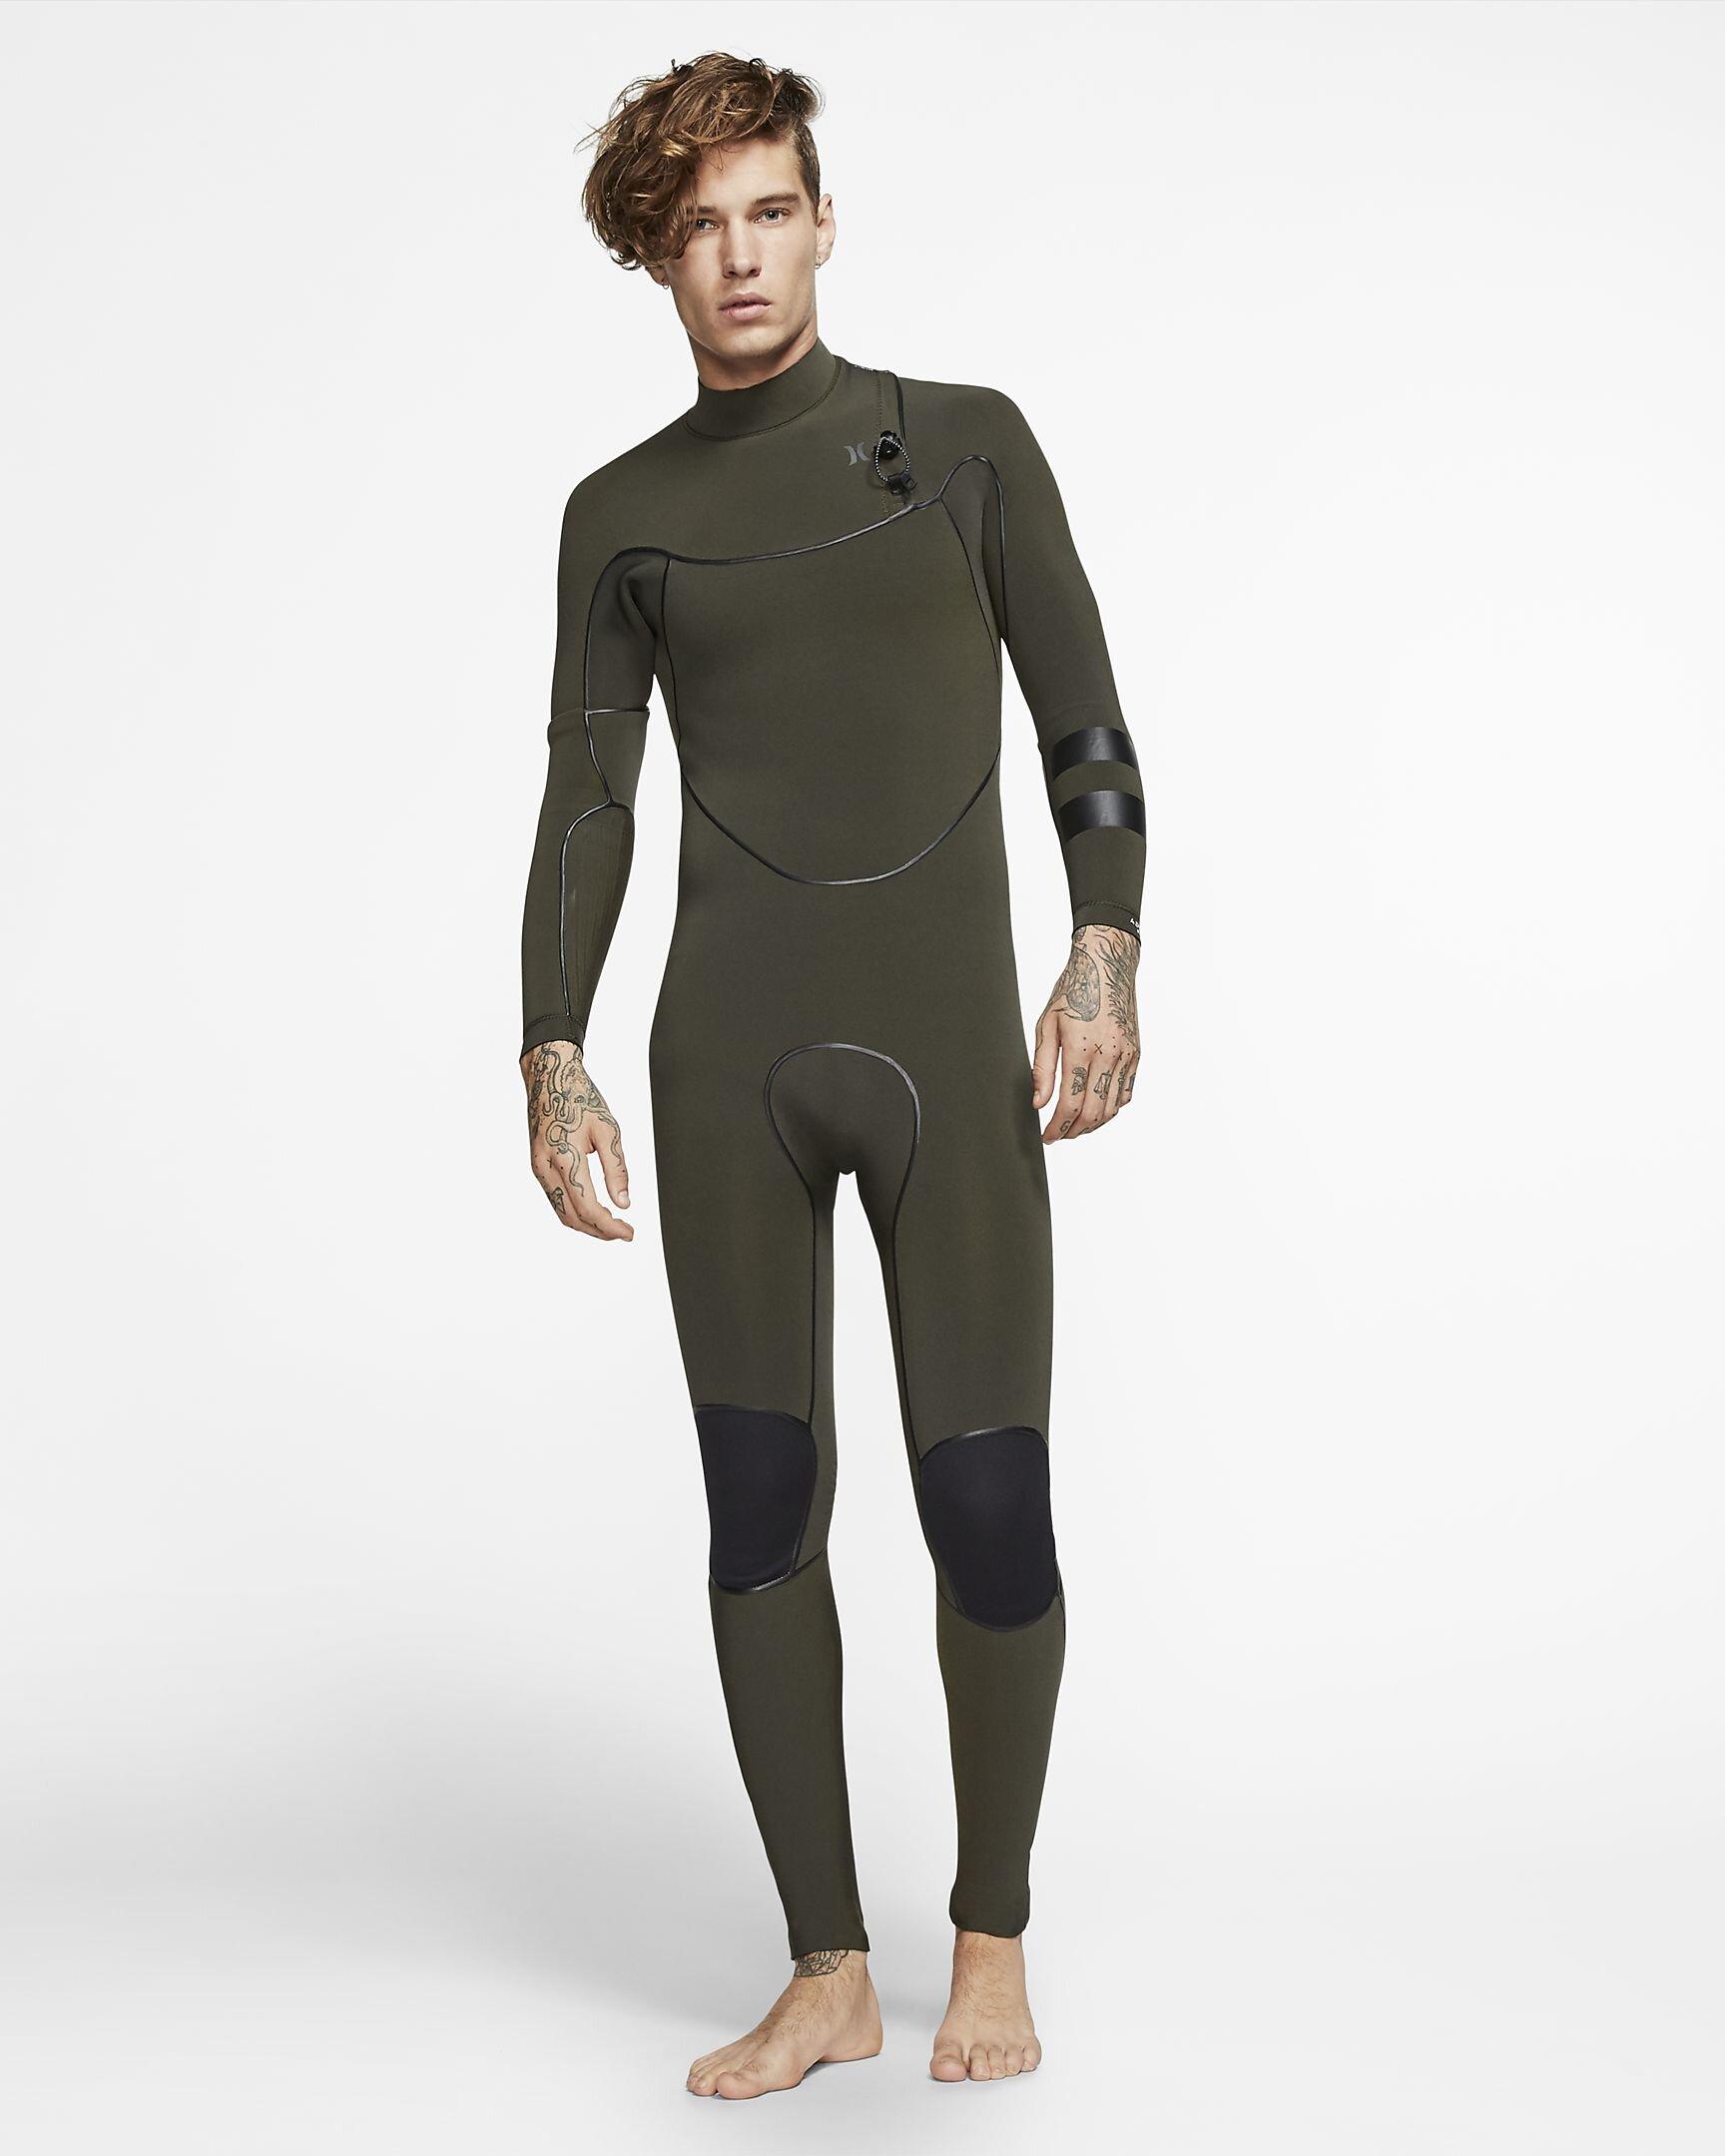 hurley-advantage-max-3-2mm-fullsuit-boys-wetsuit-drcrn8-1.jpg